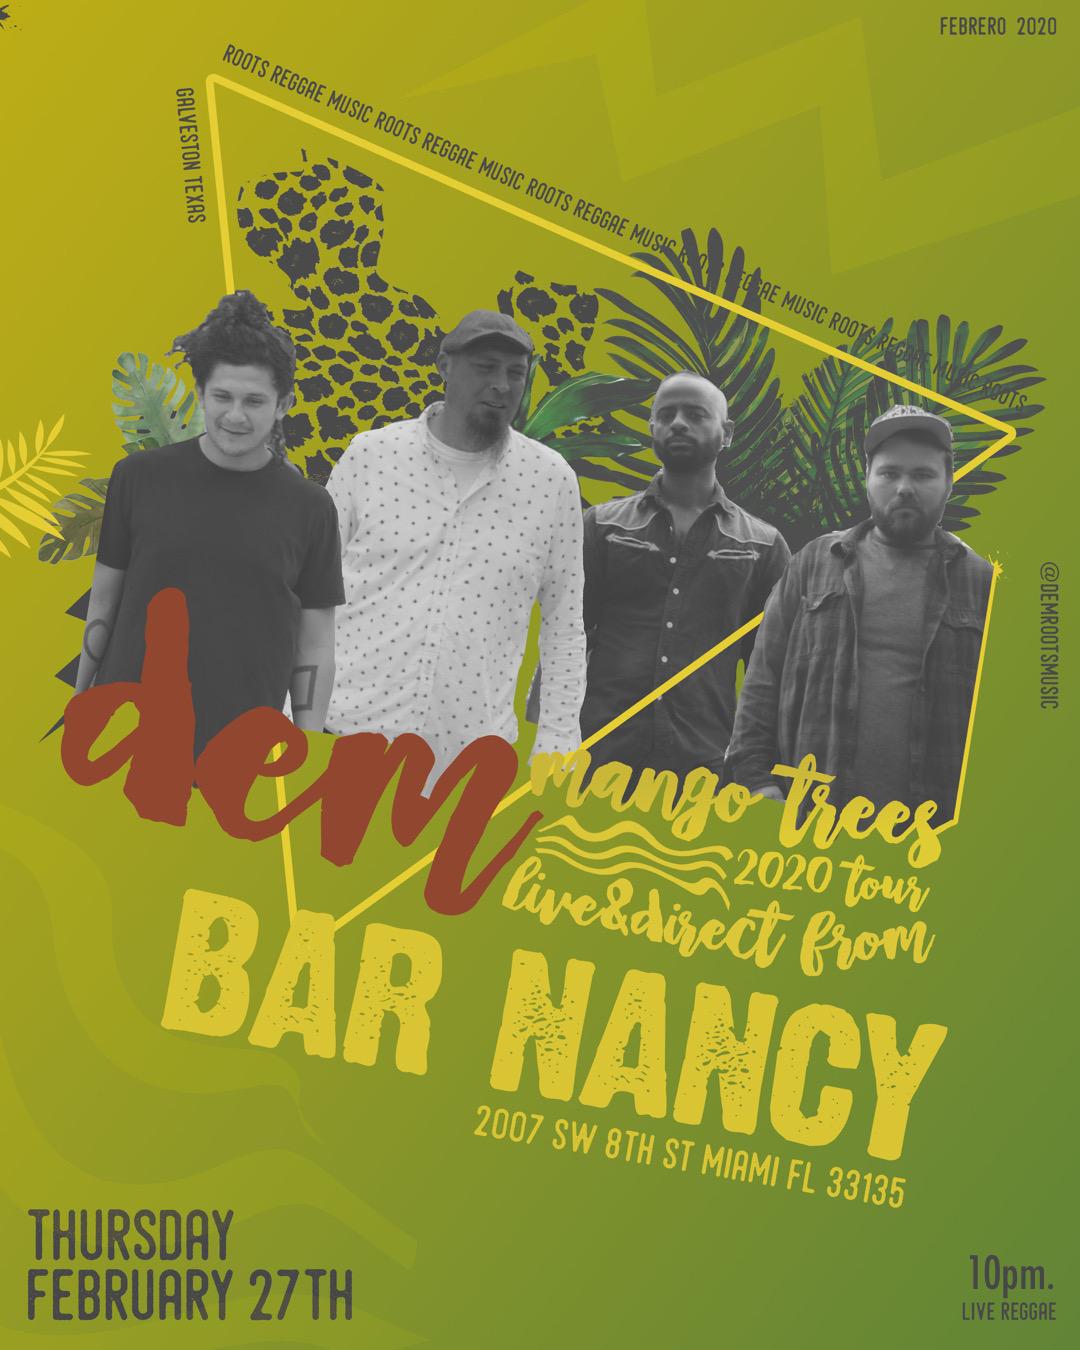 Dem at Bar Nancy - Thursday, February 27, 2020 at 8 PM